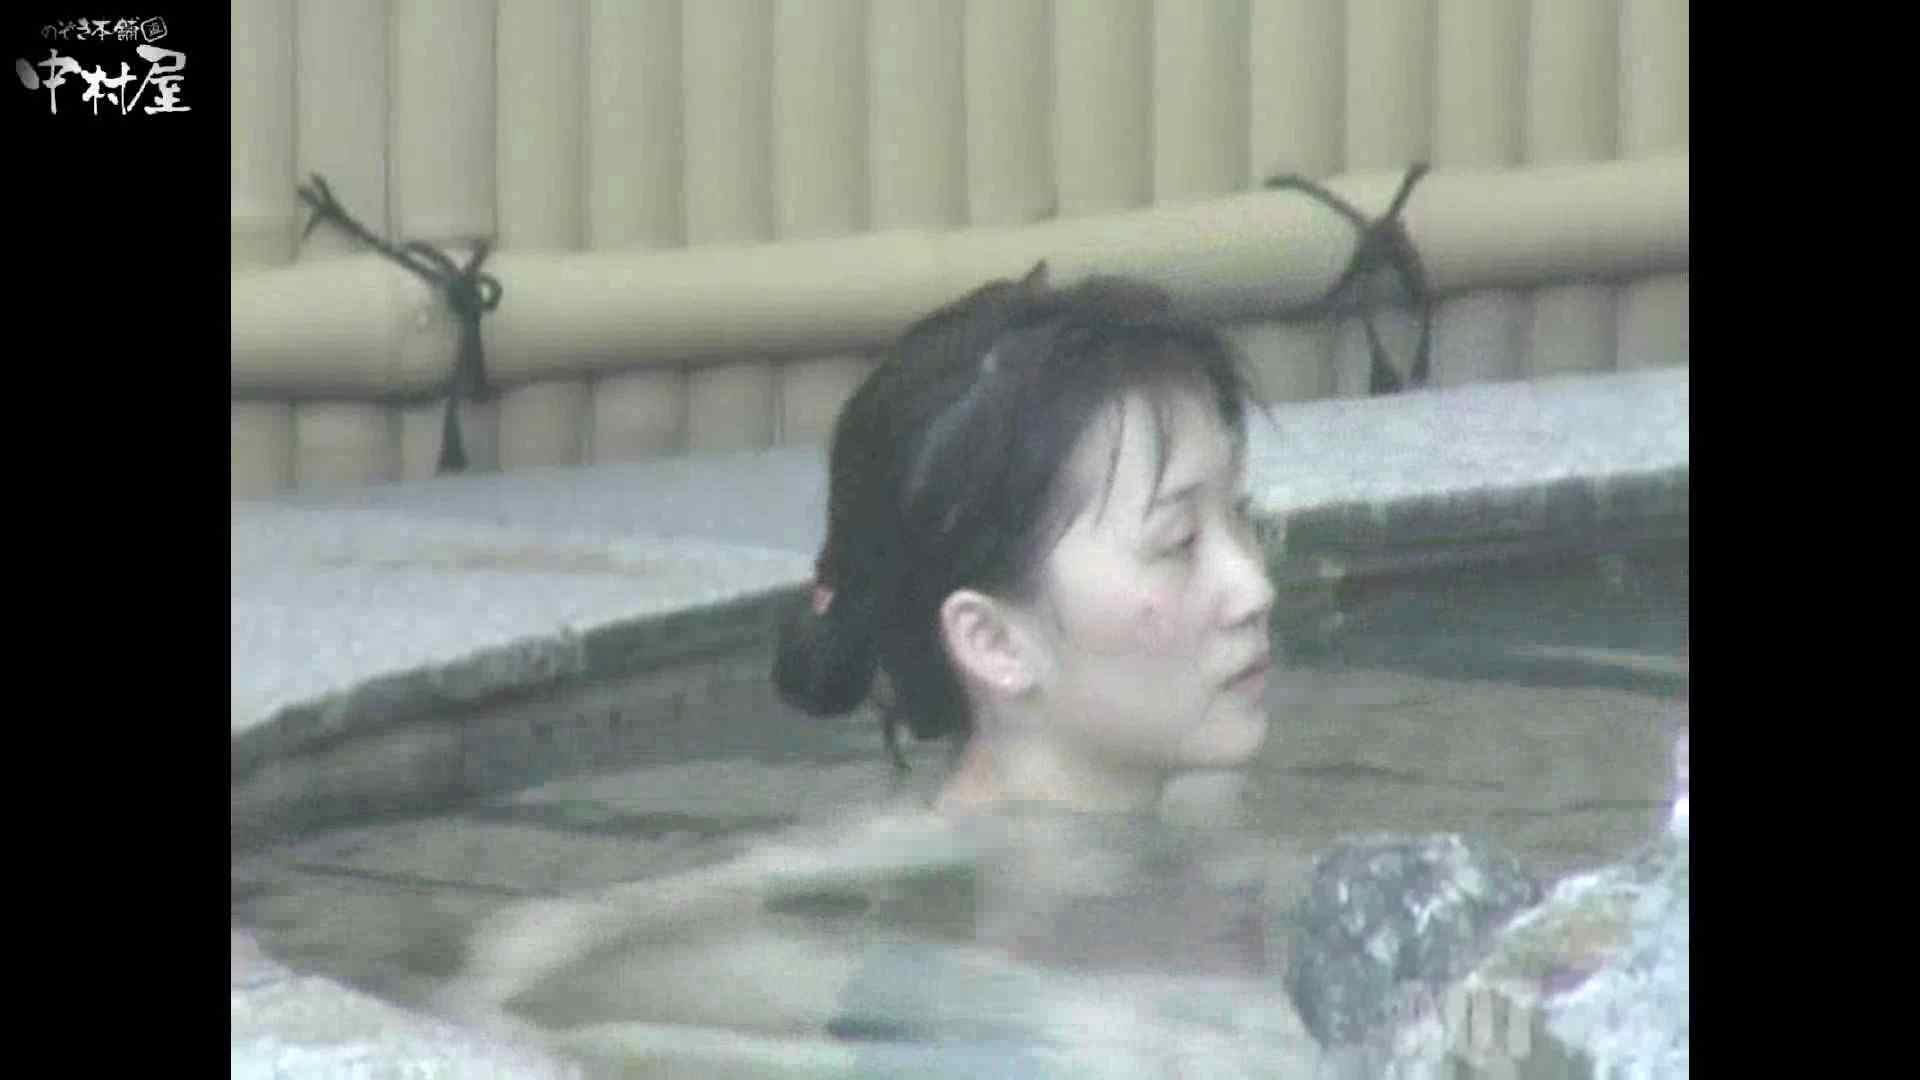 Aquaな露天風呂Vol.878潜入盗撮露天風呂十五判湯 其の一 盗撮師作品 おまんこ動画流出 74pic 50